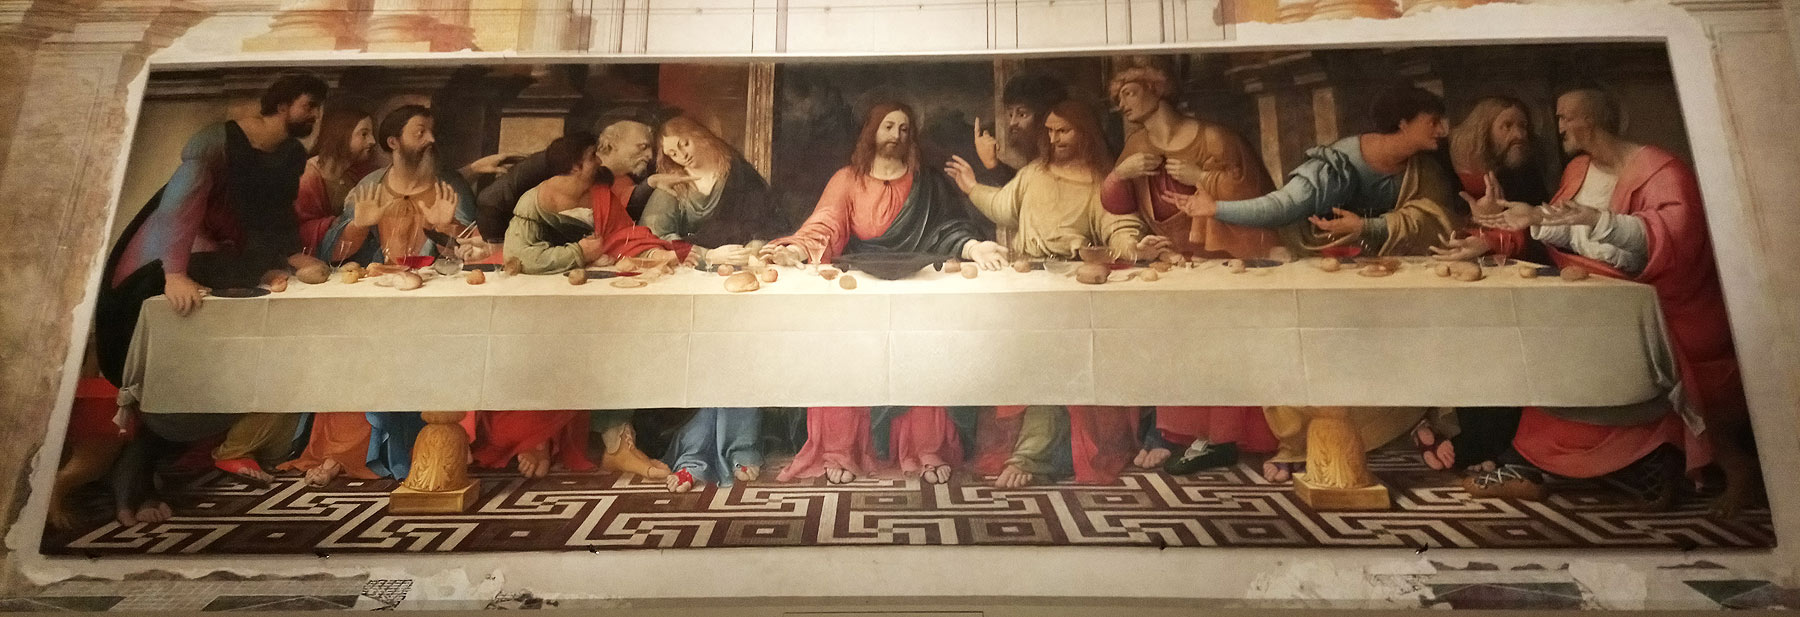 Girolamo Bonsignori, Ultima cena (1514 circa; olio su tela, 234 x 722 cm; Badia Polesine, Museo Civico)